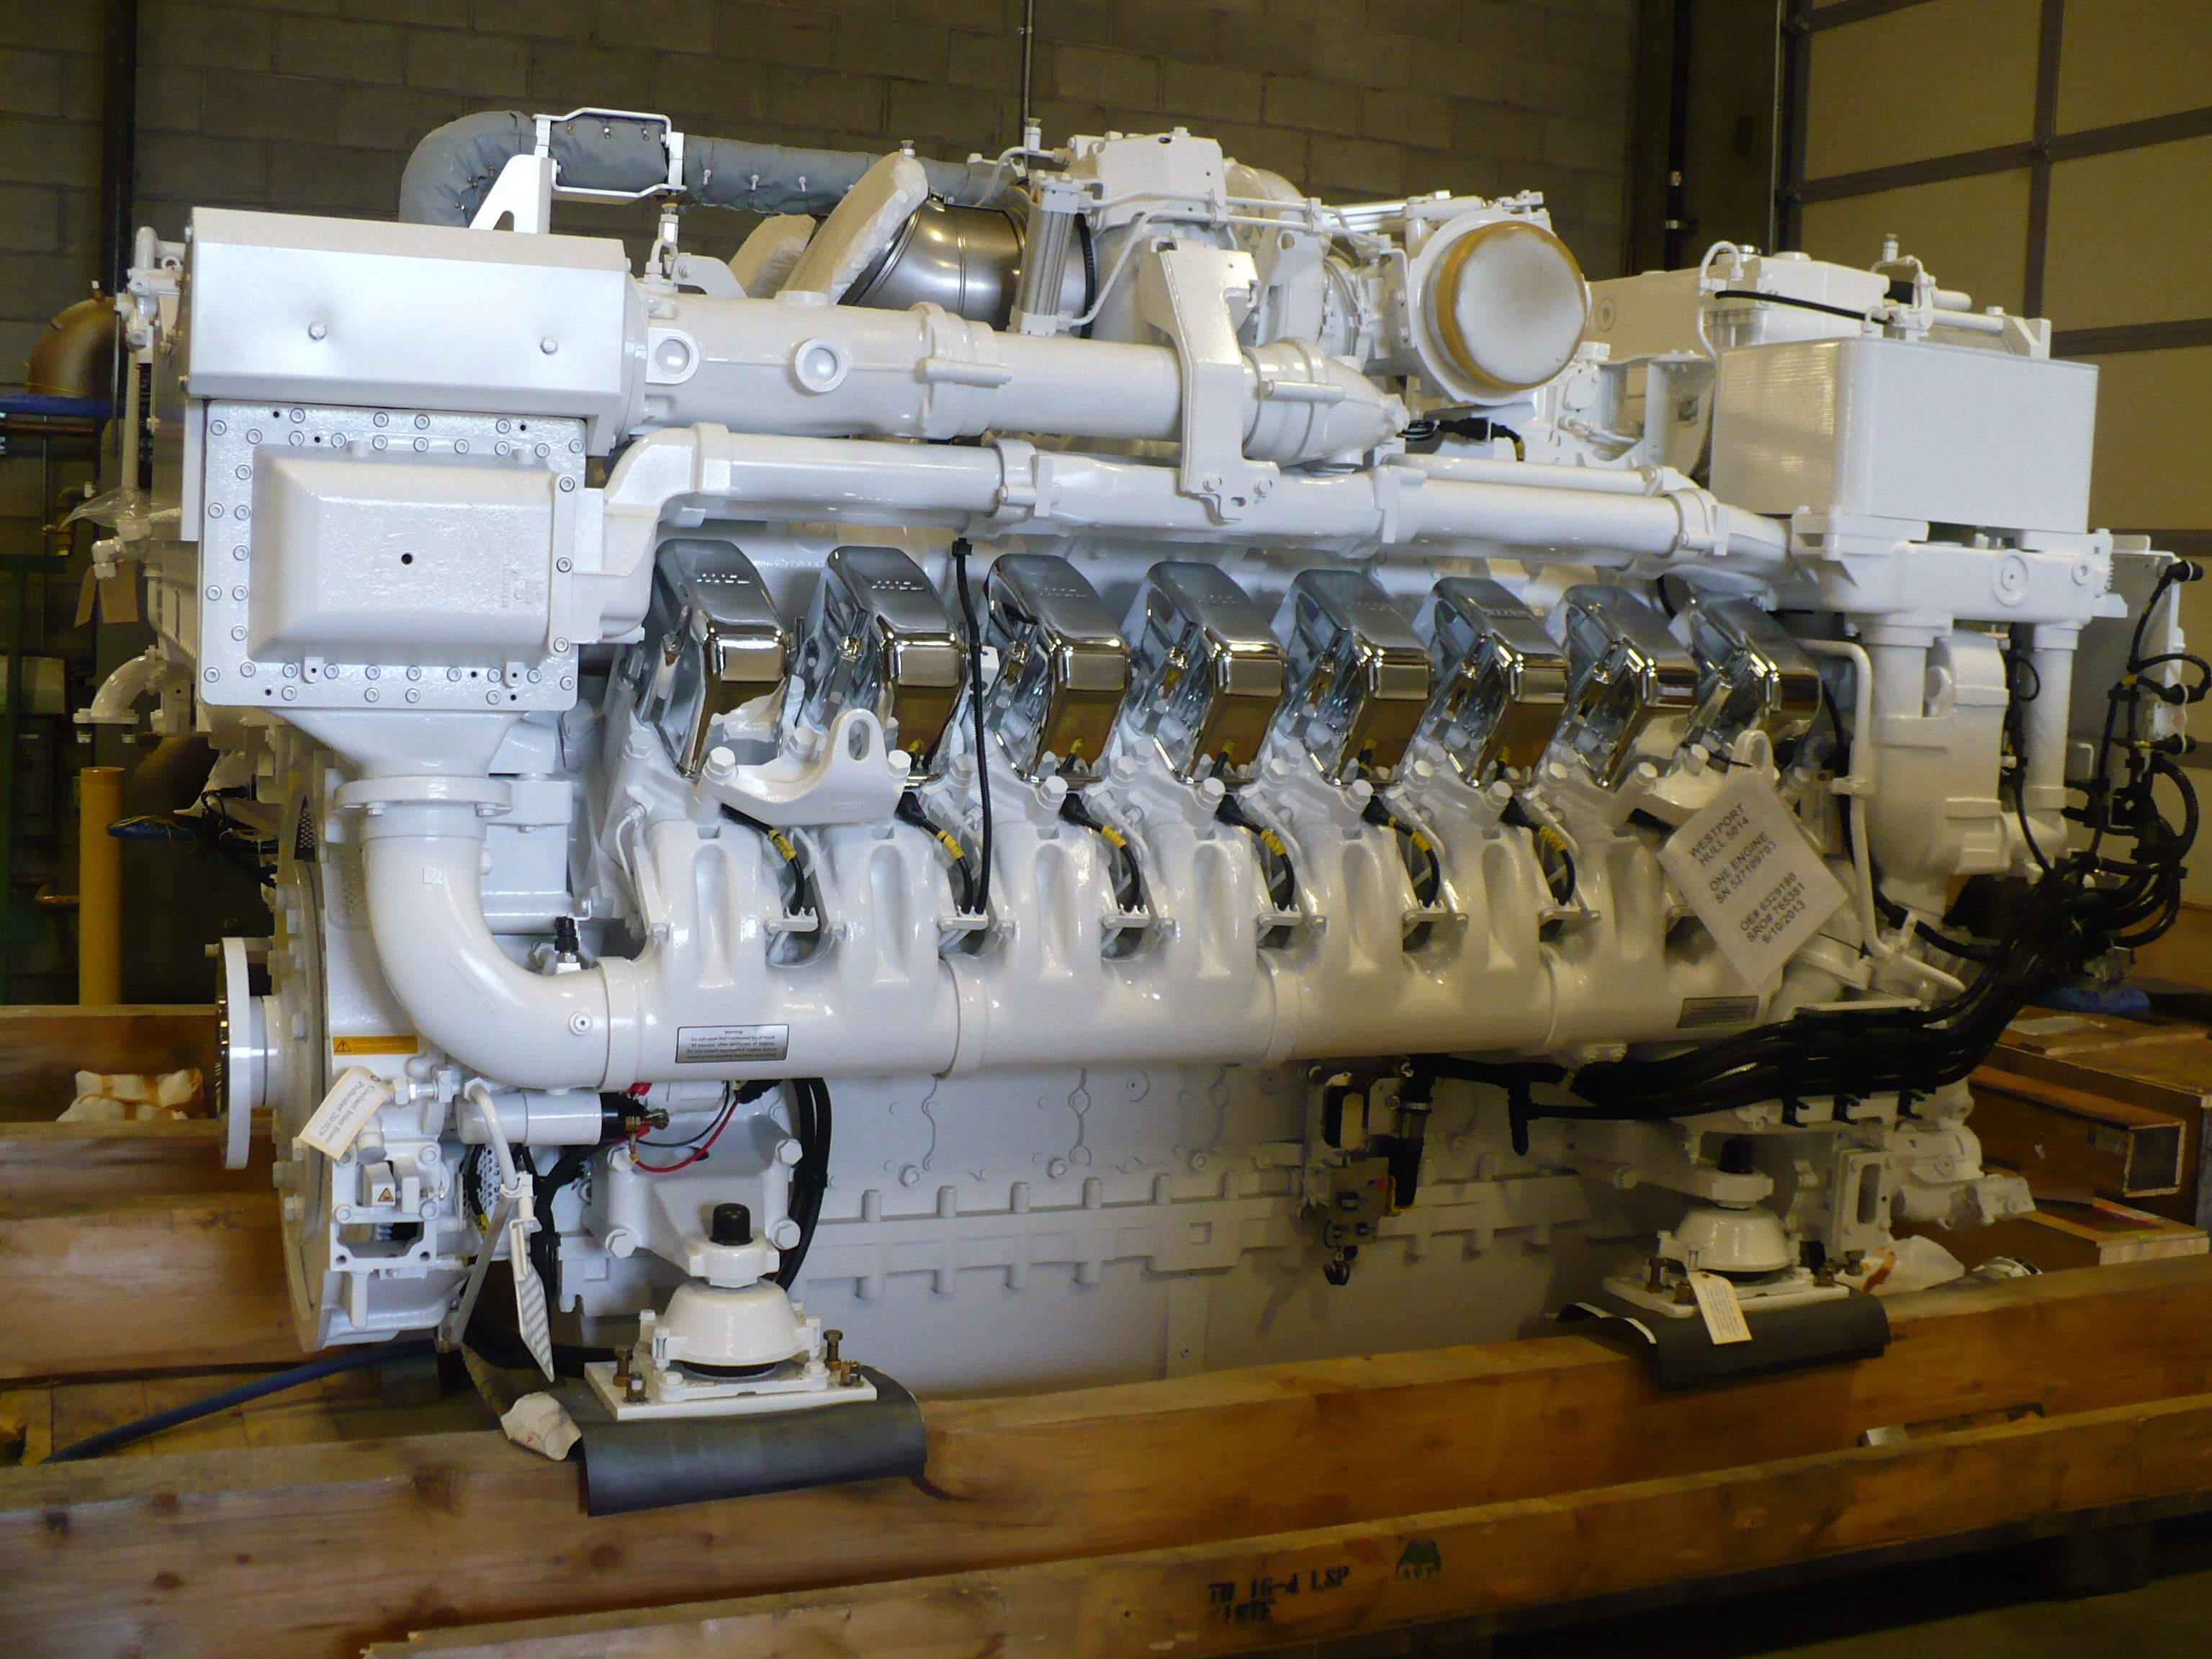 16v4000 mtu dieselengine